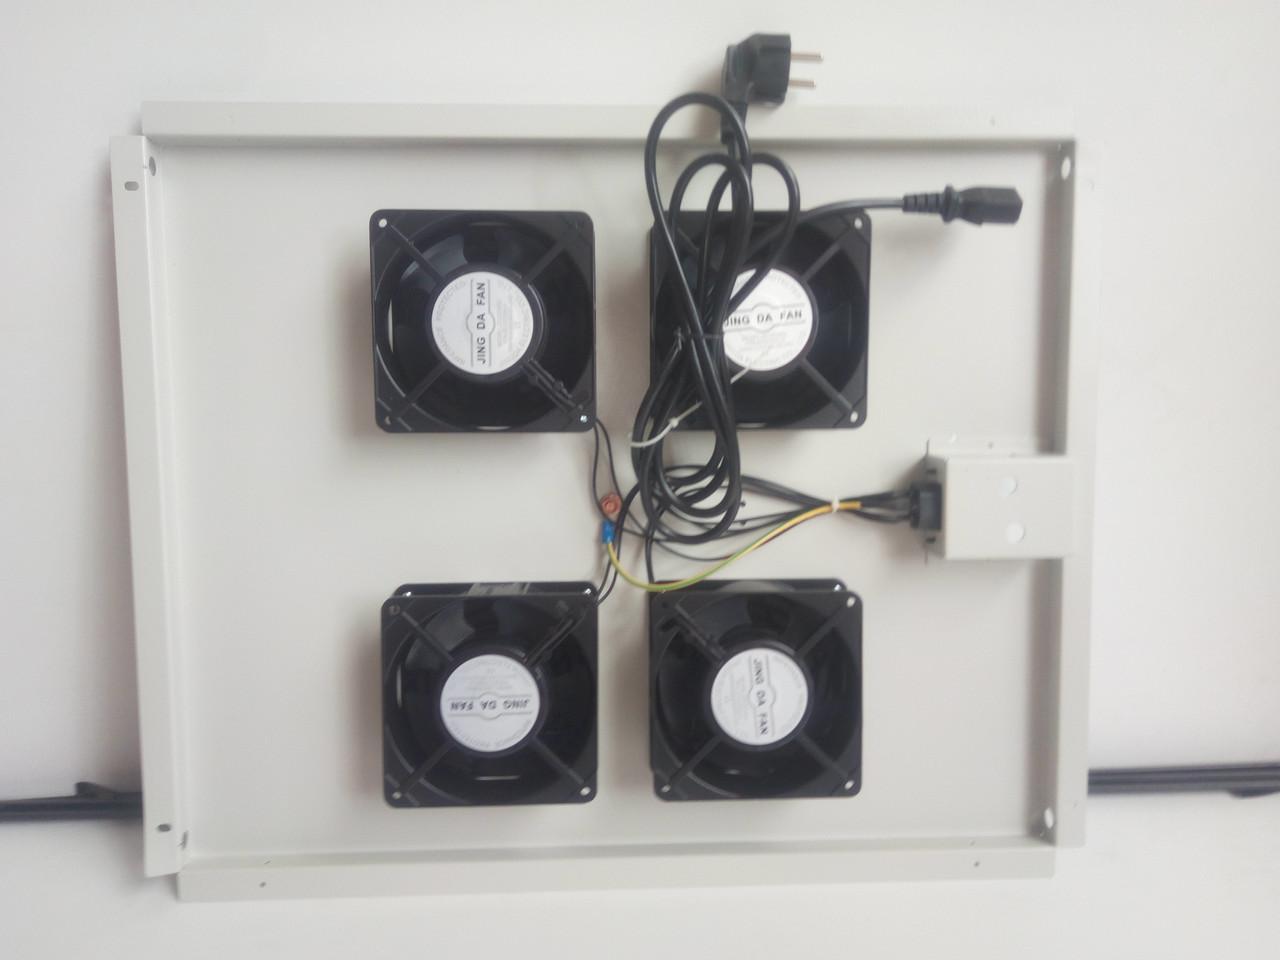 Вентиляторный блок на 4 кулера. 555х450х40мм